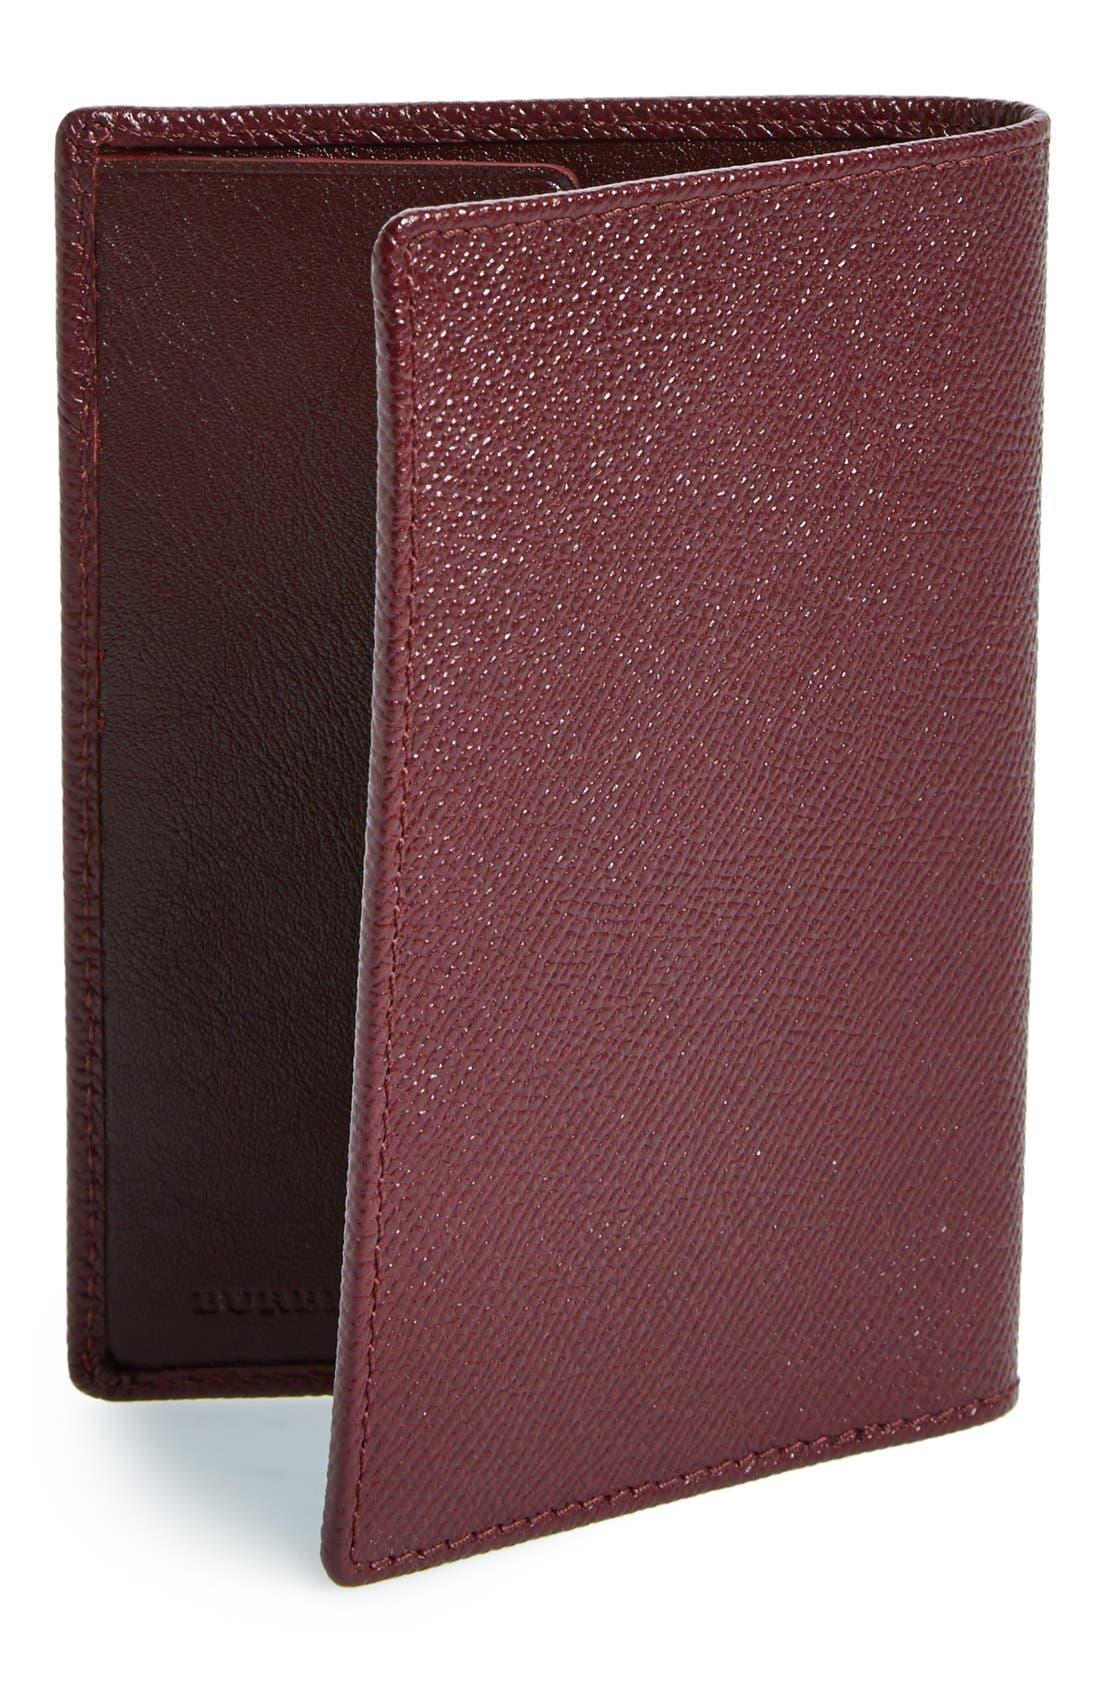 BURBERRY,                             Leather Passport Case,                             Alternate thumbnail 3, color,                             600